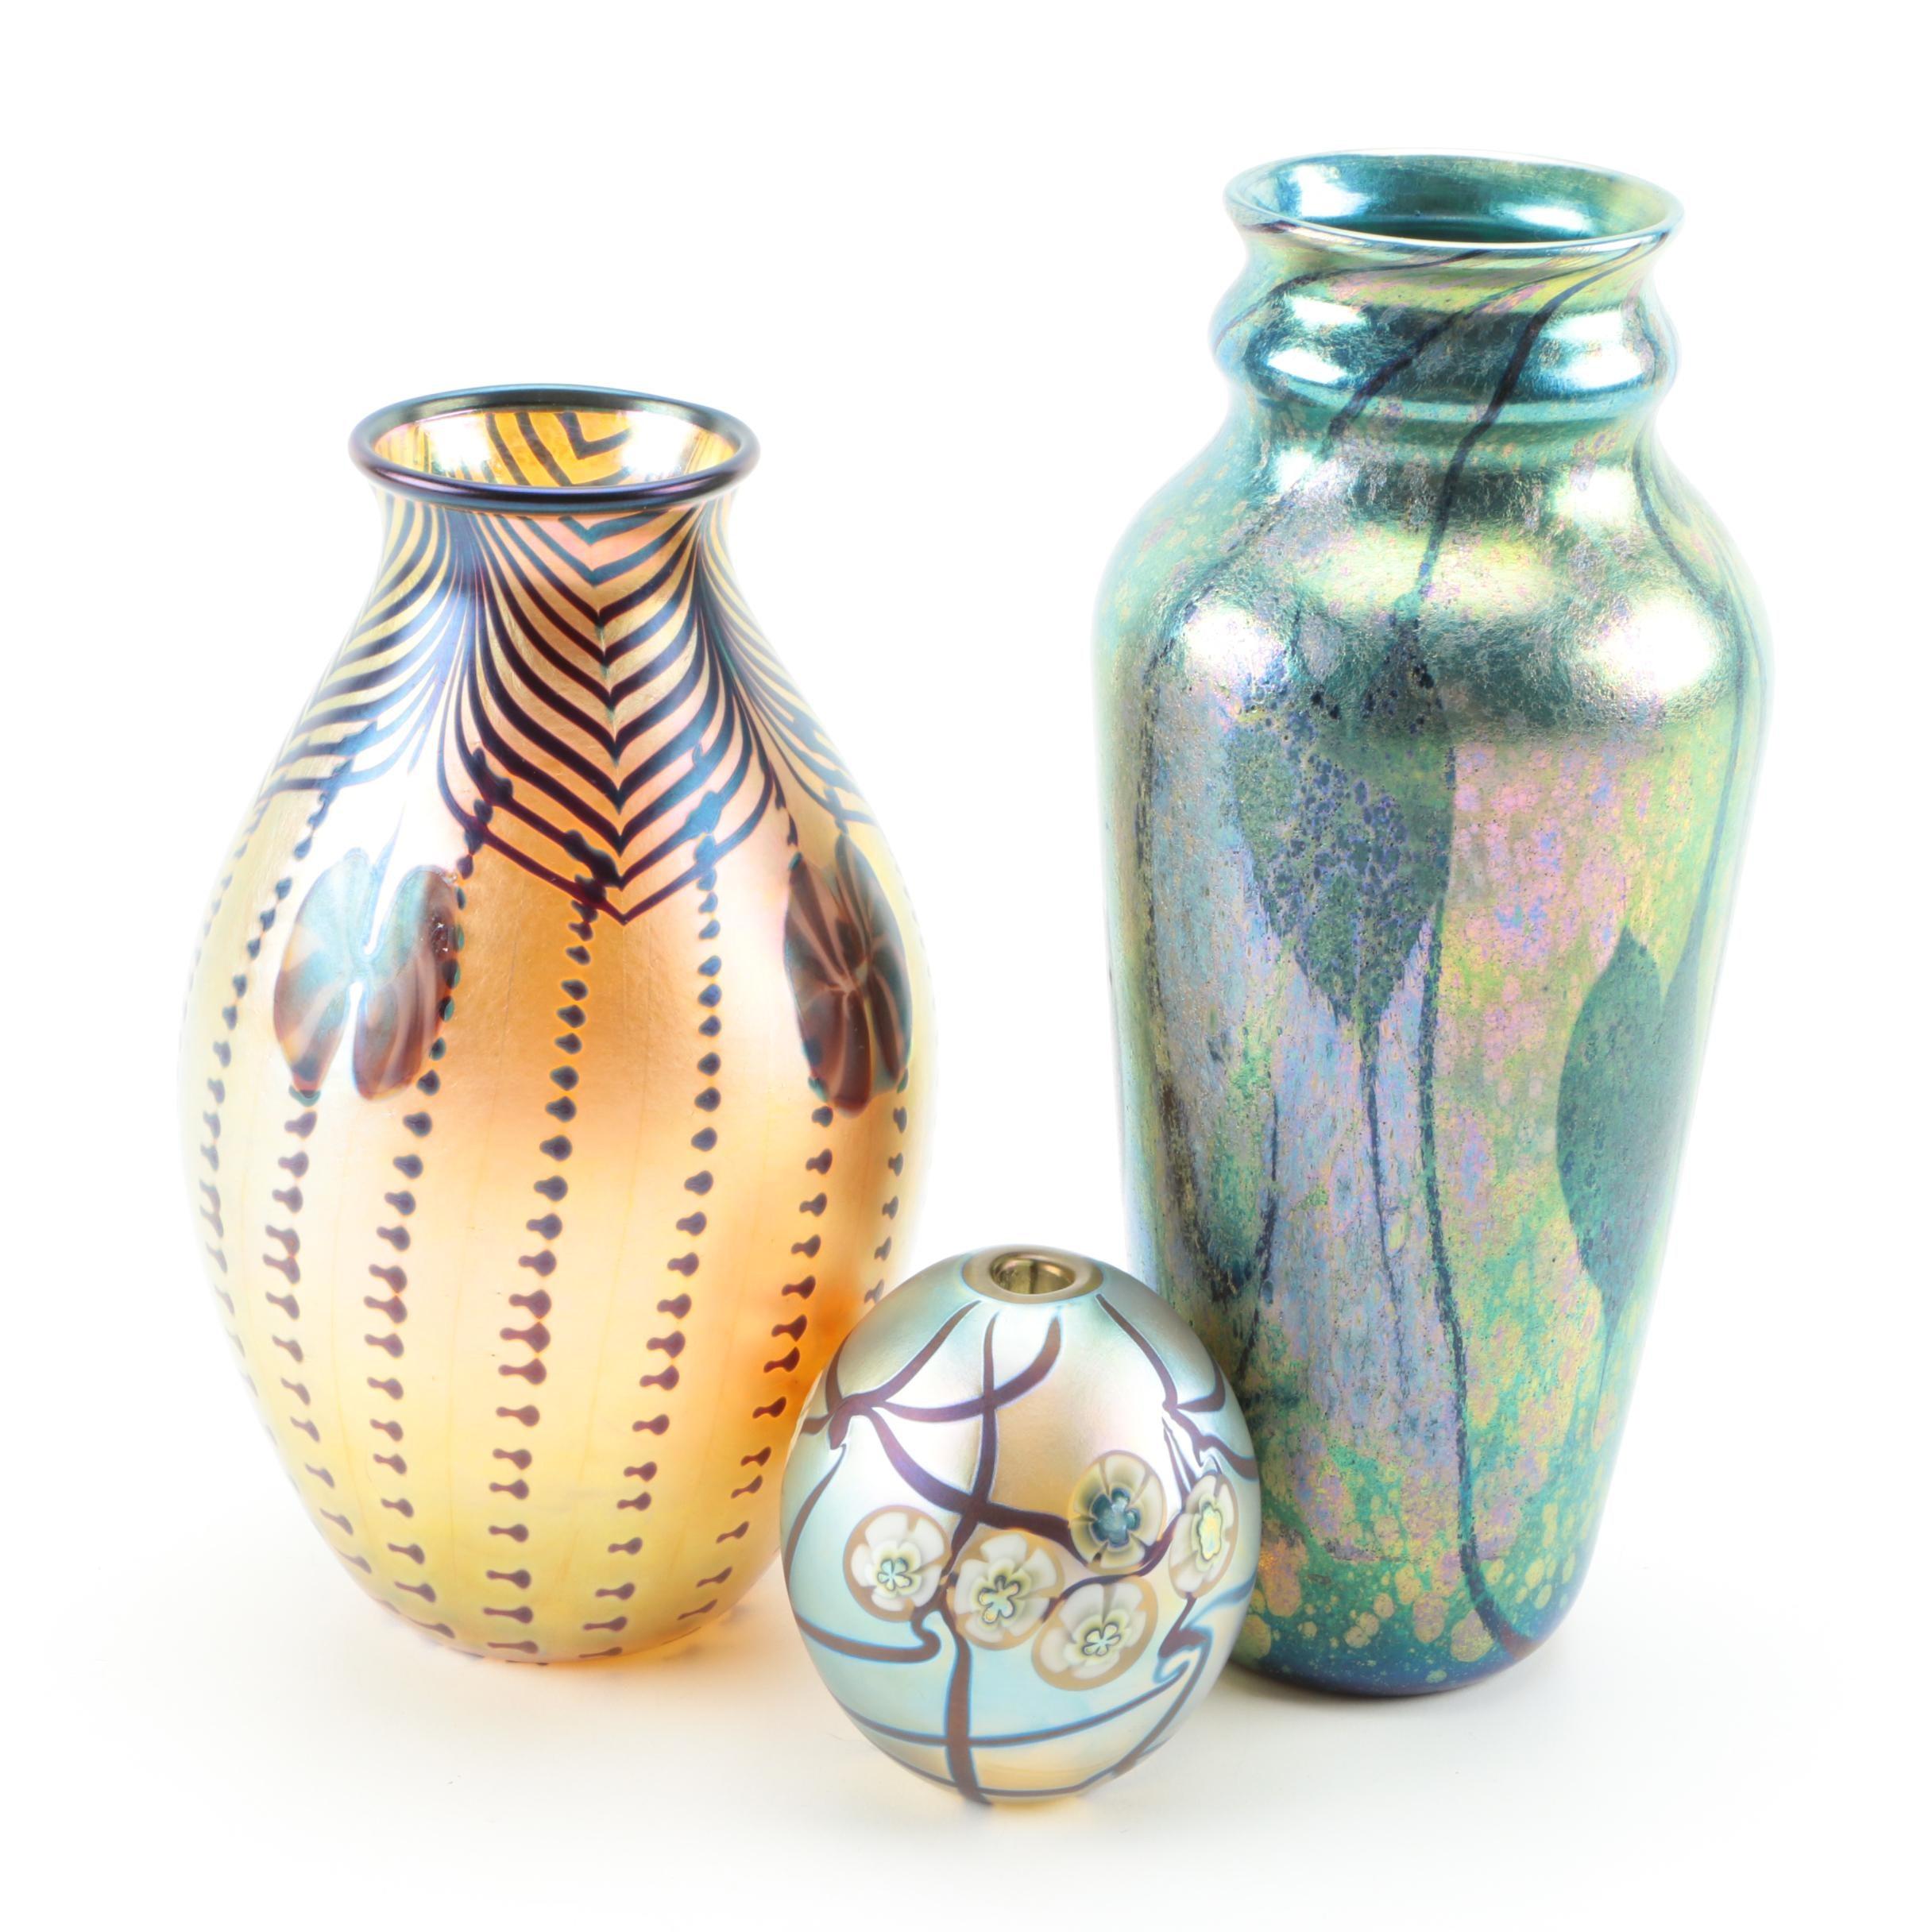 Vintage Iridescent Art Glass Vases Including Orient & Flume and Robert Eickholt